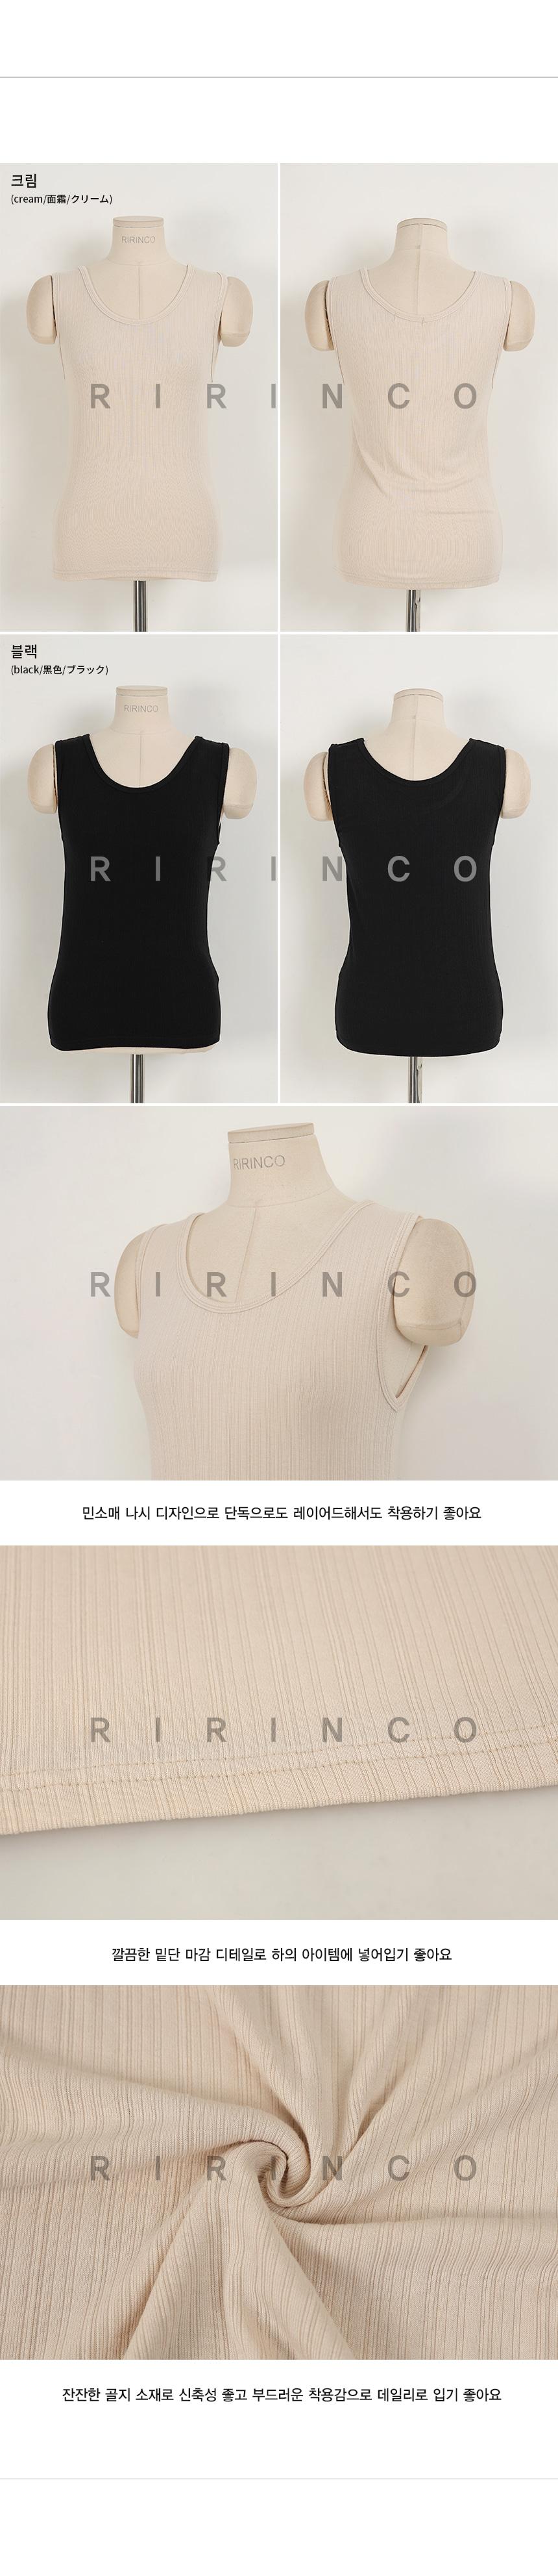 RIRINCO ラウンドネックノースリーブリブニットトップス